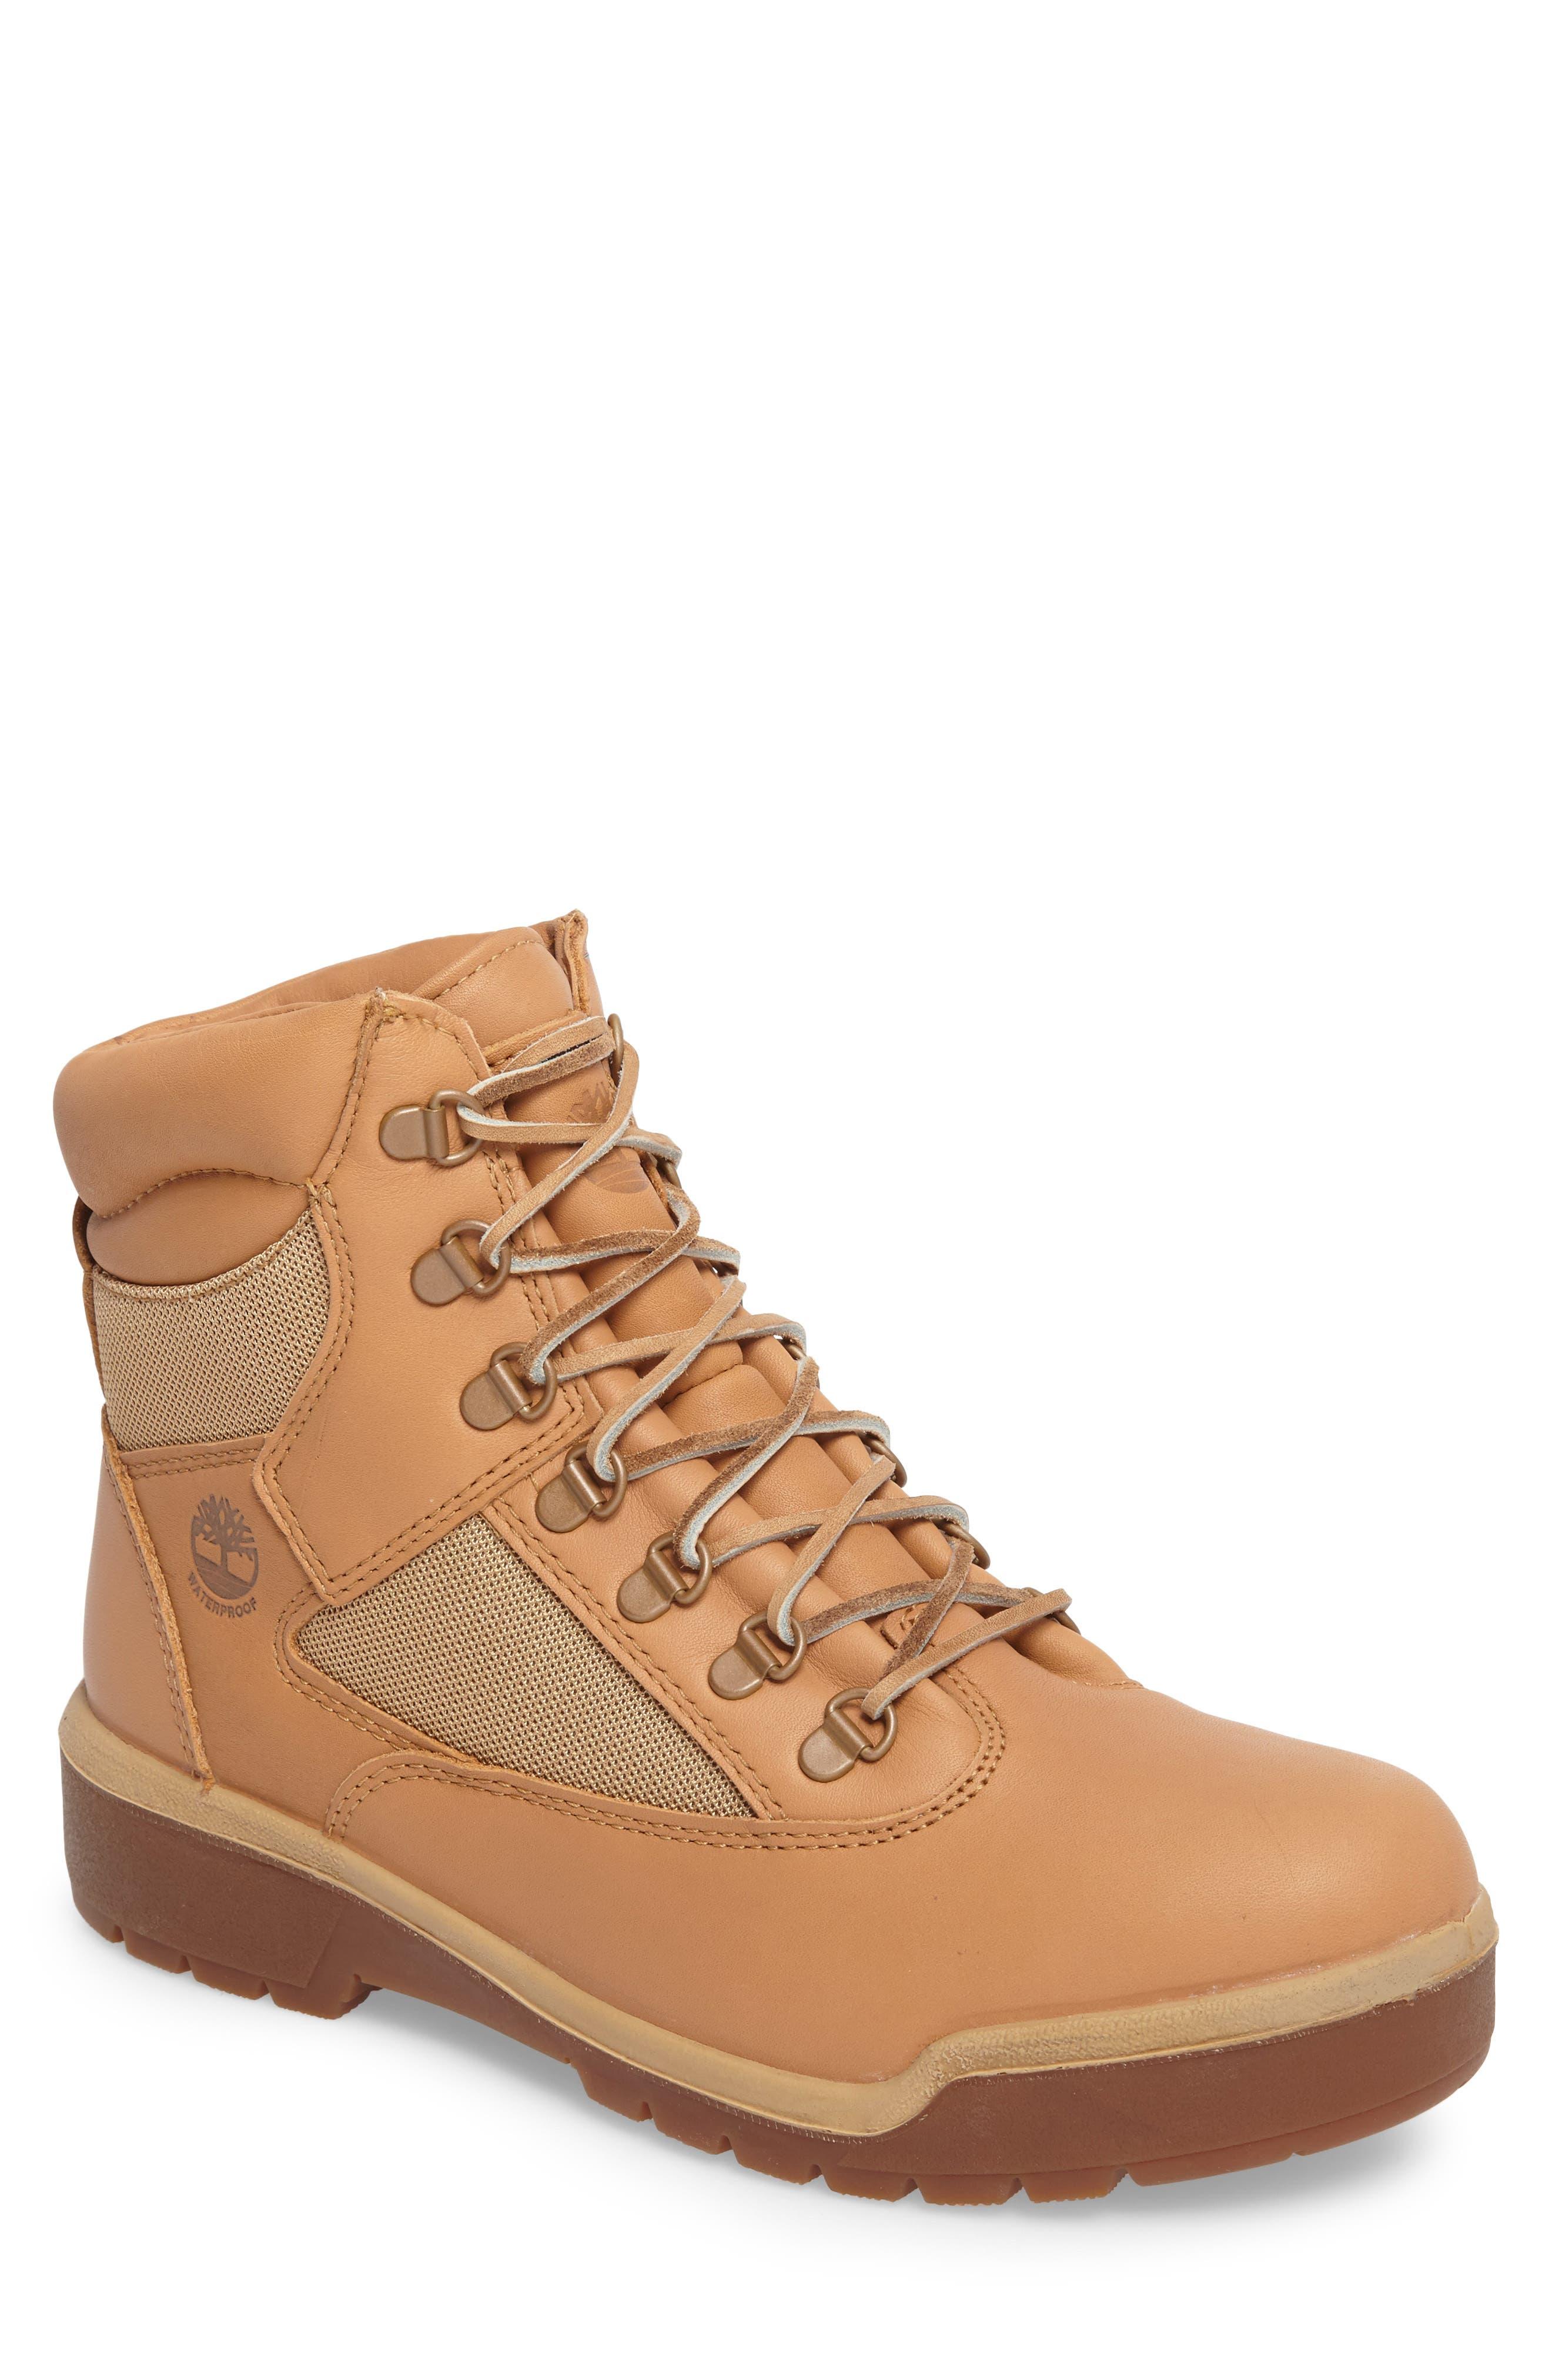 Waterproof Boot,                         Main,                         color, Natural Hoween/ Latigo Leather